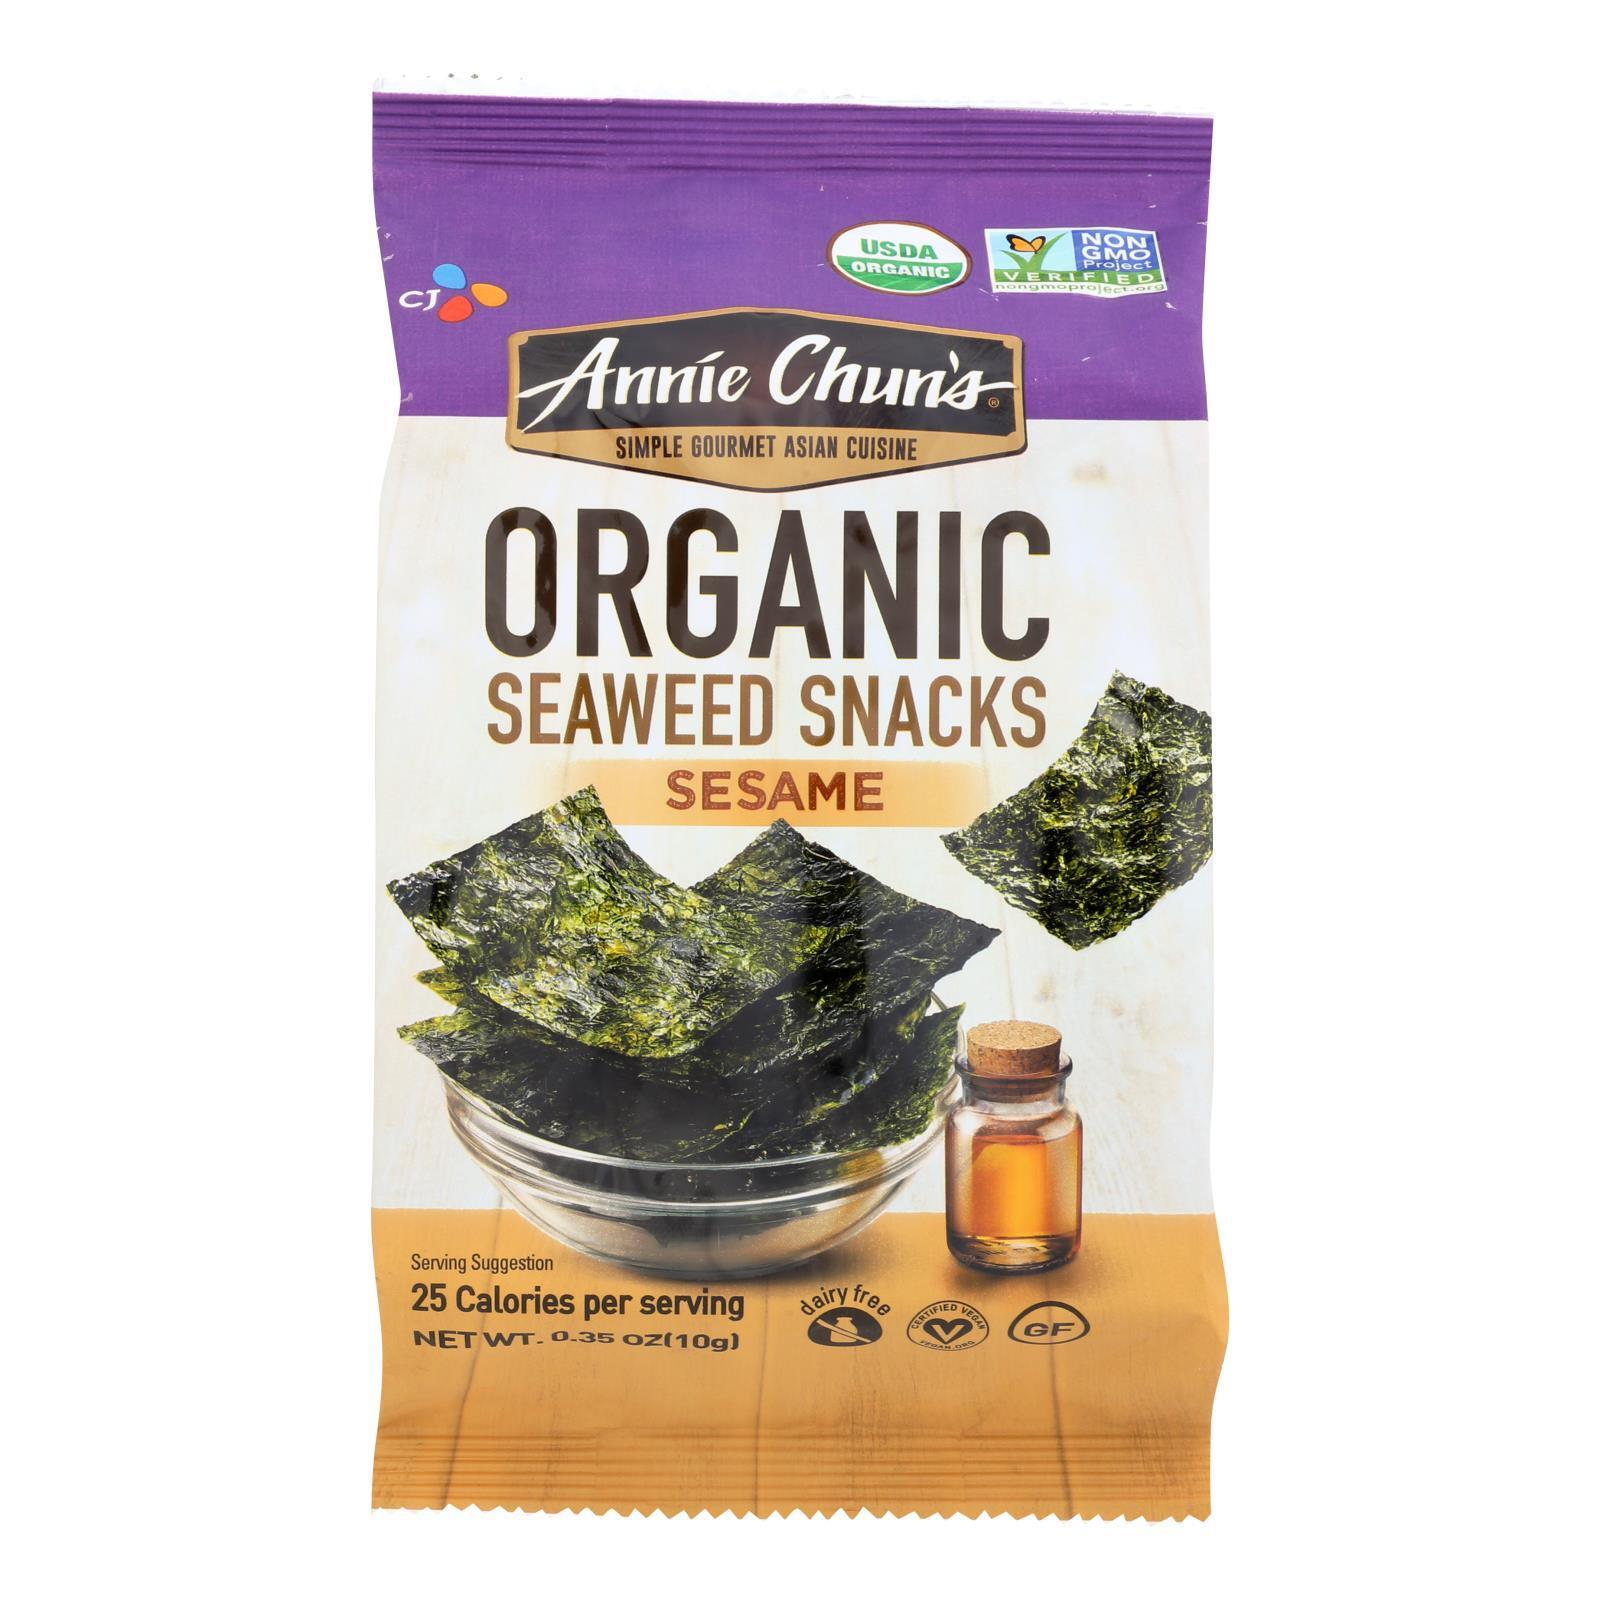 Annie Chun's Organic Seaweed Snacks Sesame - Case of 12 - 0.35 oz.